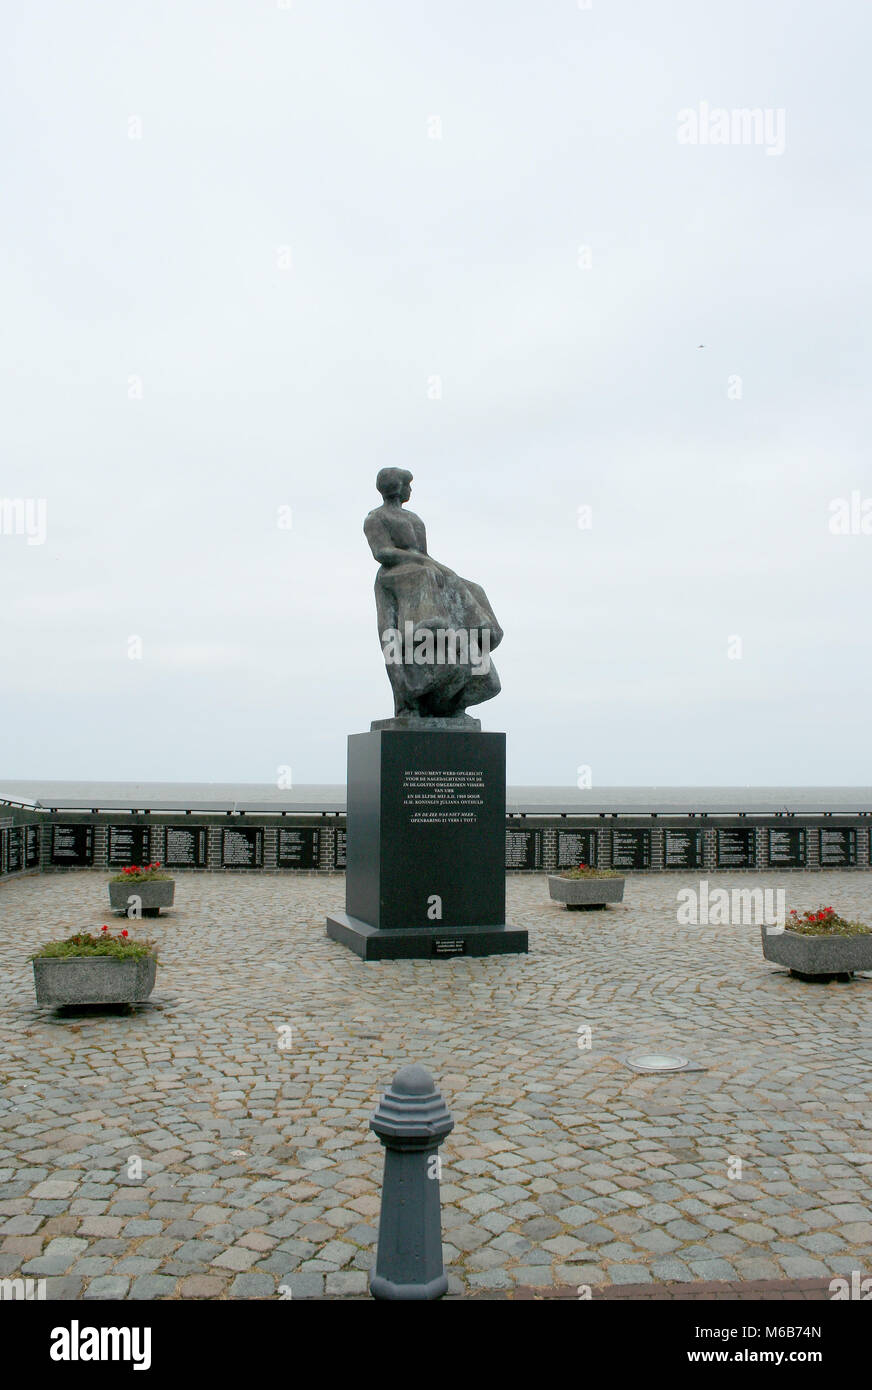 Netherlands,Flevoland,Urk,june 2017: monument for the missing or dead fishermen - Stock Image